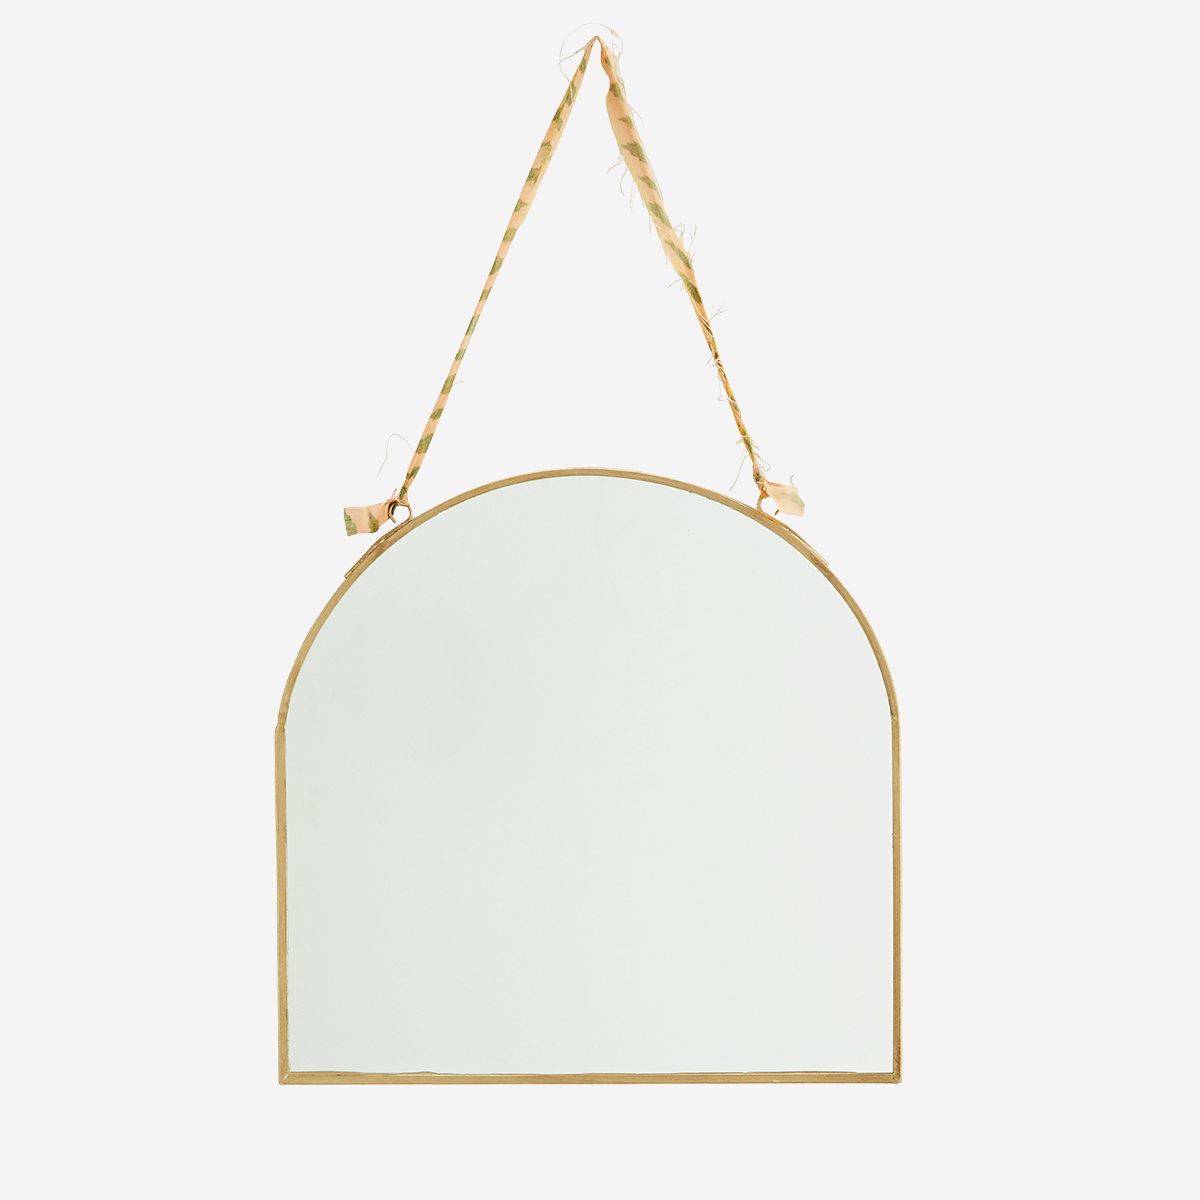 Miroir laiton bord haut arrondi * Madam Stoltz